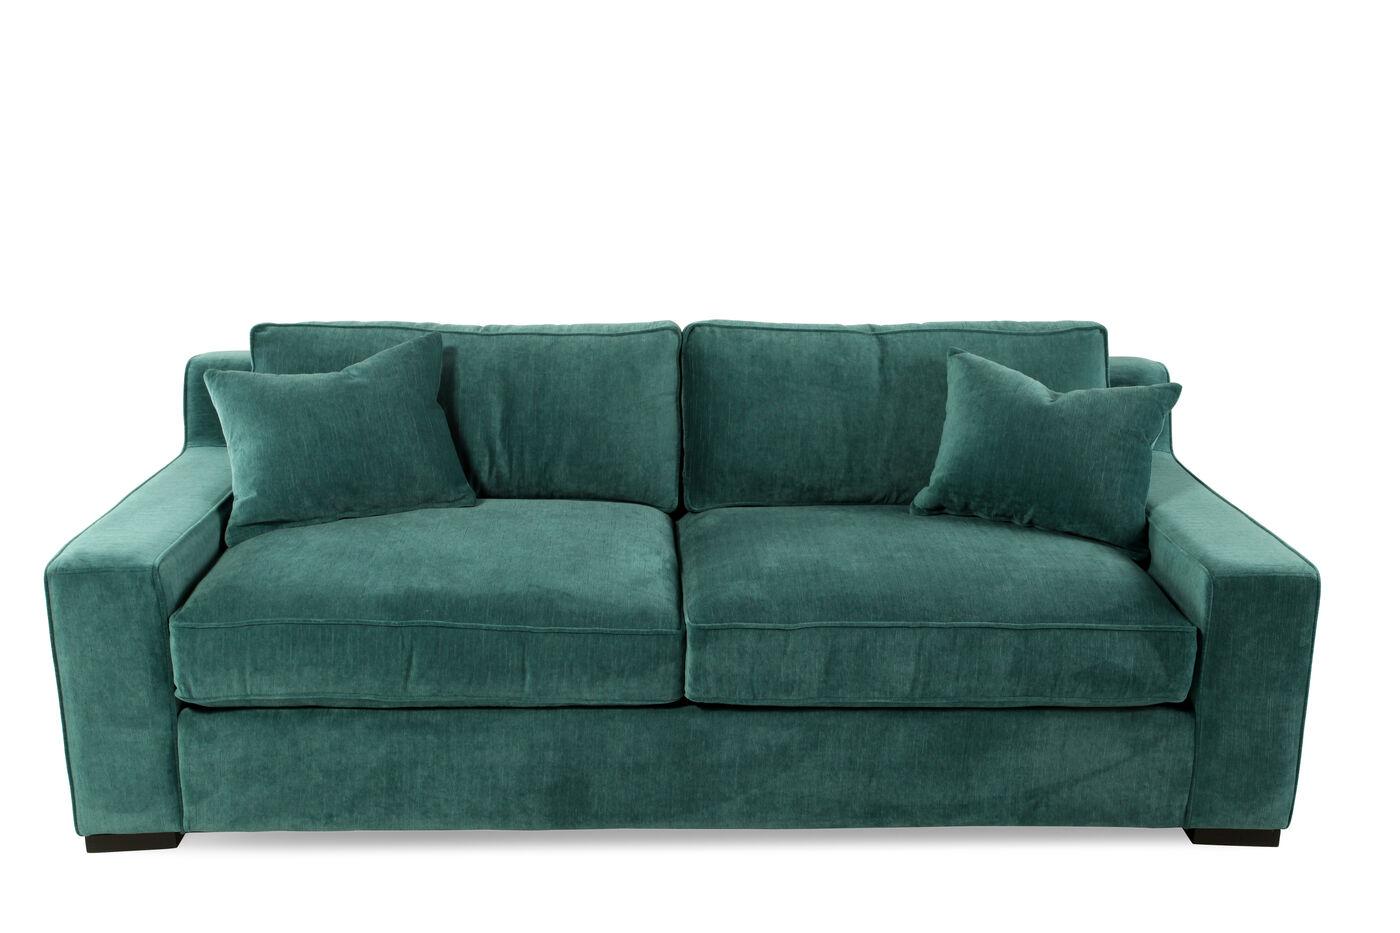 Low Profile Microfiber 38 Quot Sofa In Emerald Green Mathis